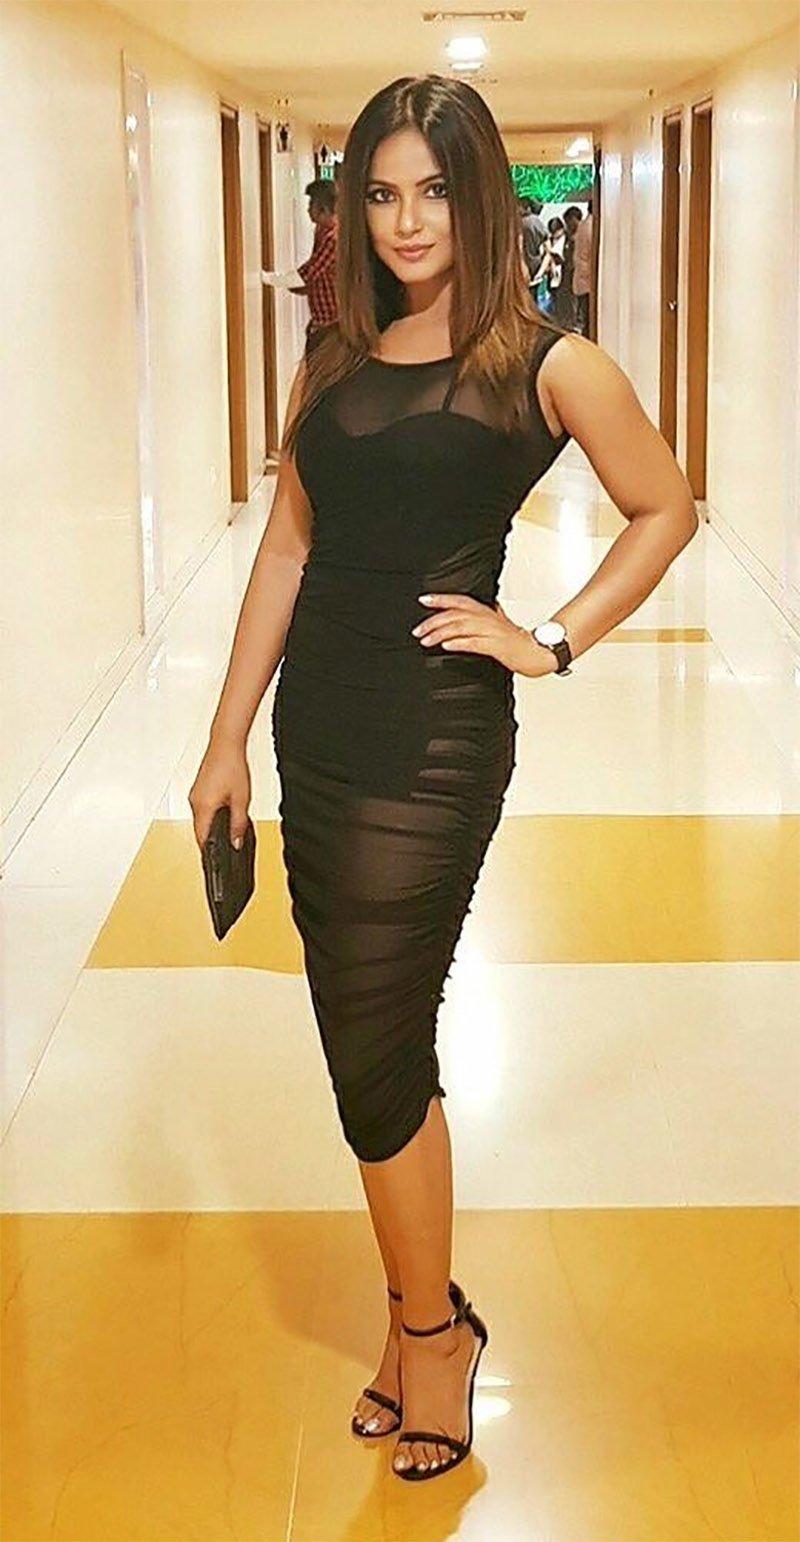 neetu chandra in a sizzling black dress